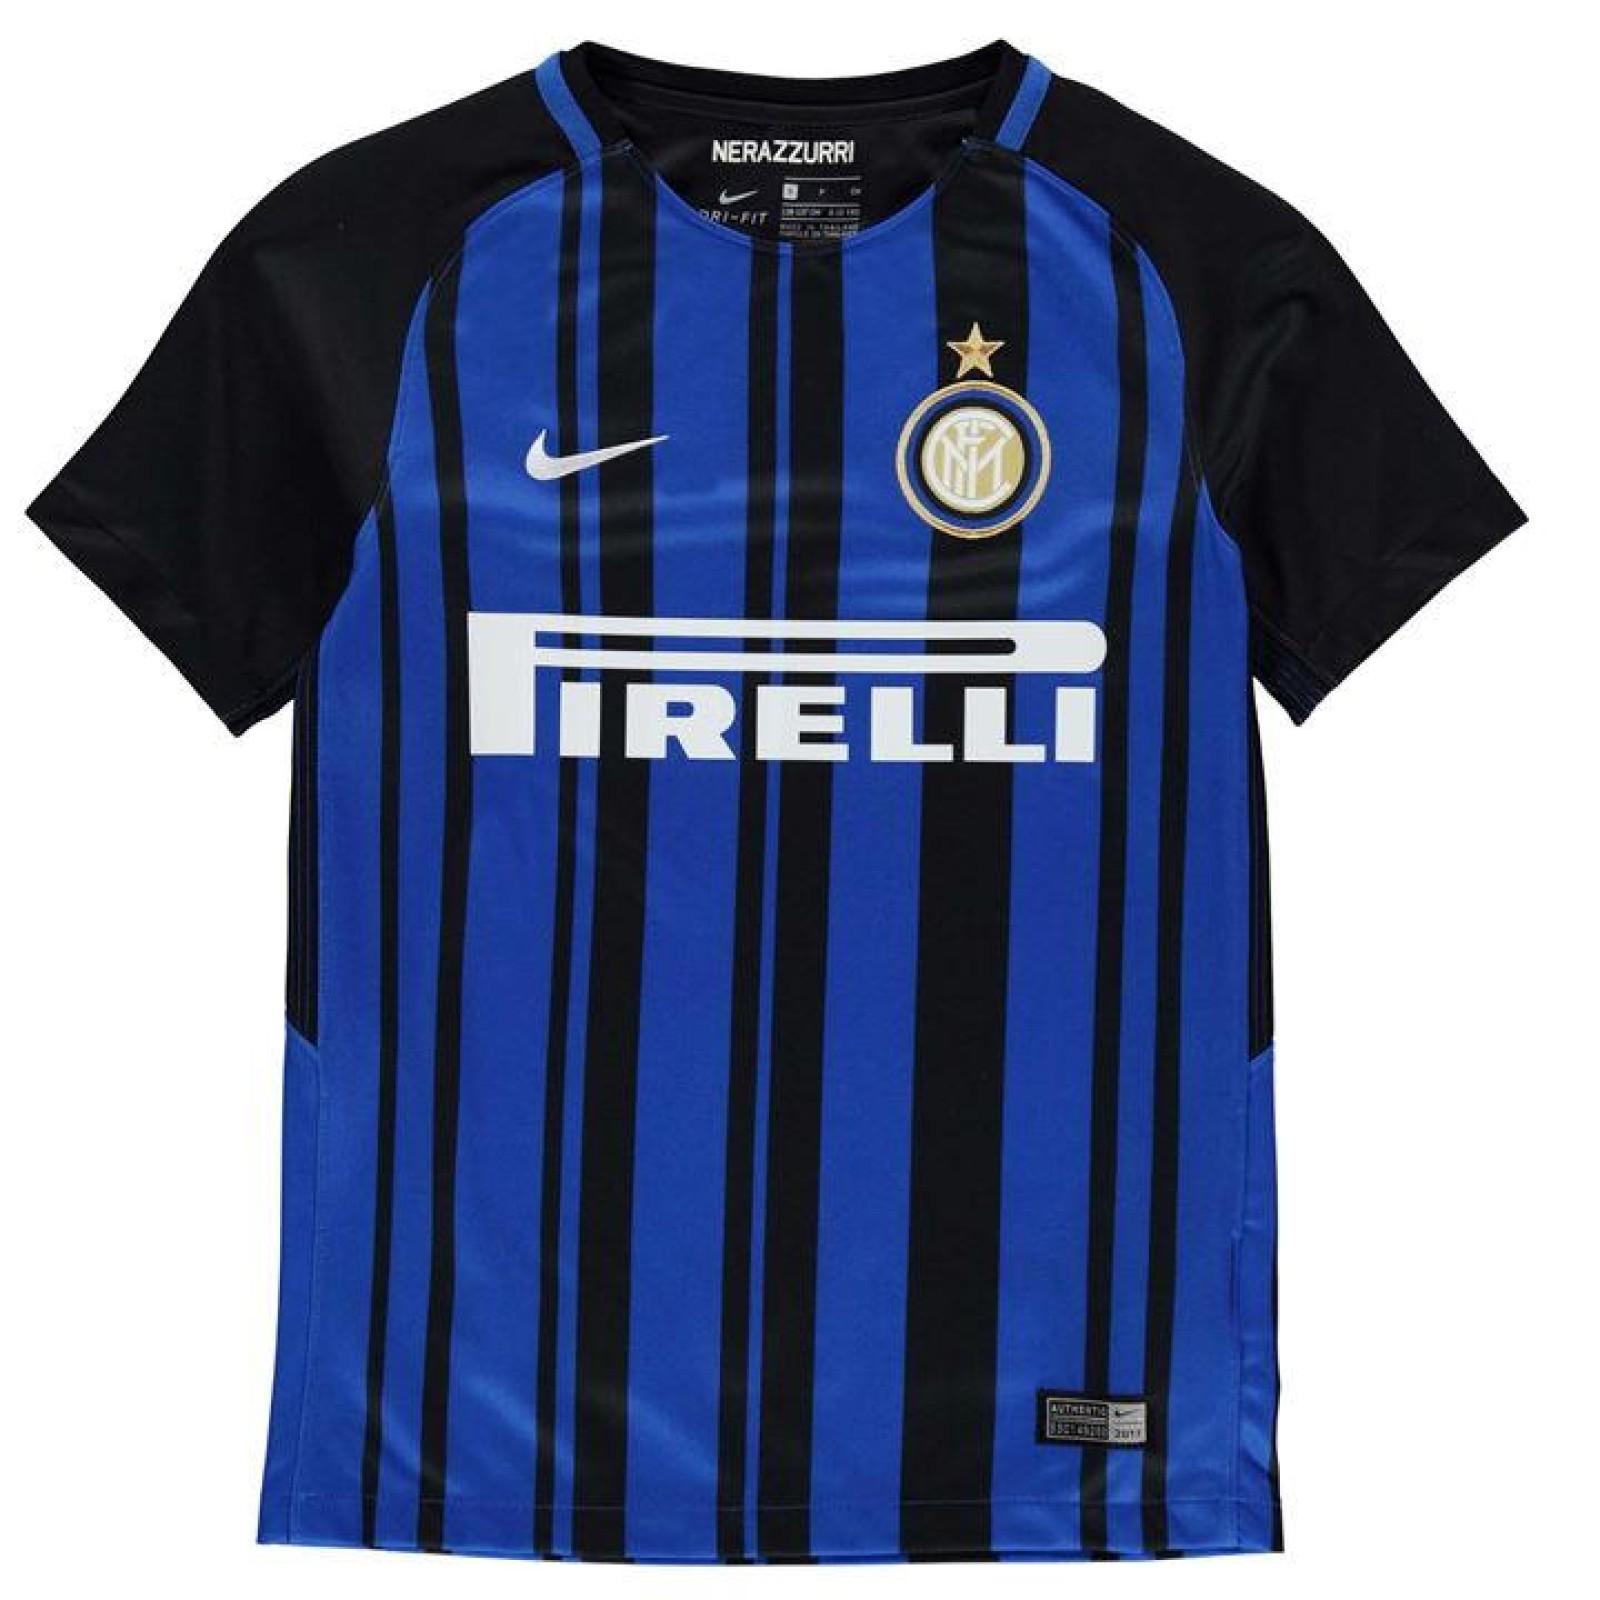 buy popular daf10 8a820 Childrens Inter Milan Home 2017/18 Football Kit | Free Shirt ...